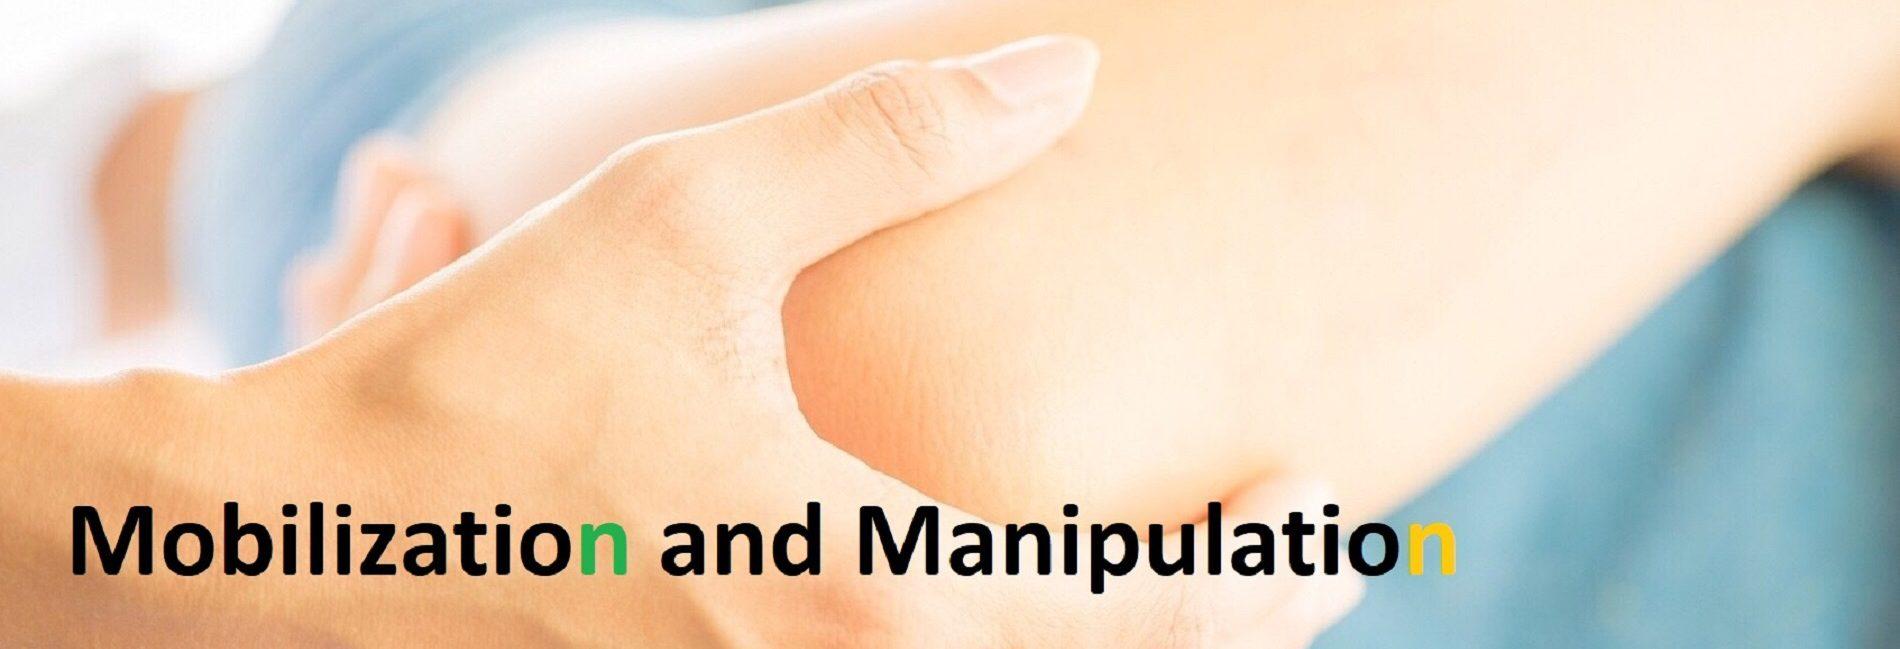 Mobilization and Manipulation